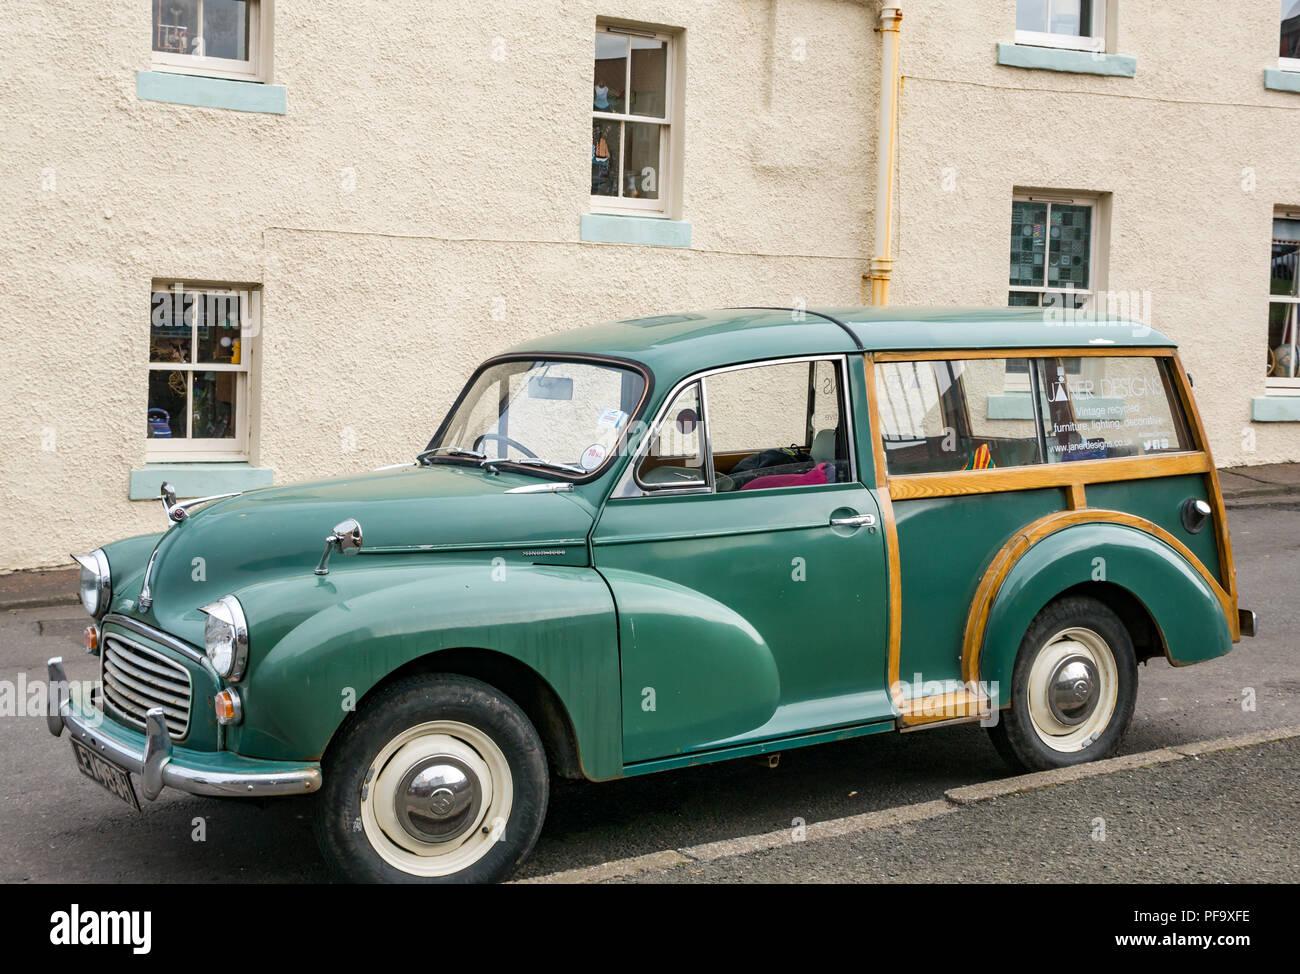 Vintage old fashione Morris Minor 1000 traveller with wood beams, Dunbar, East Lothian, Scotland, UK - Stock Image